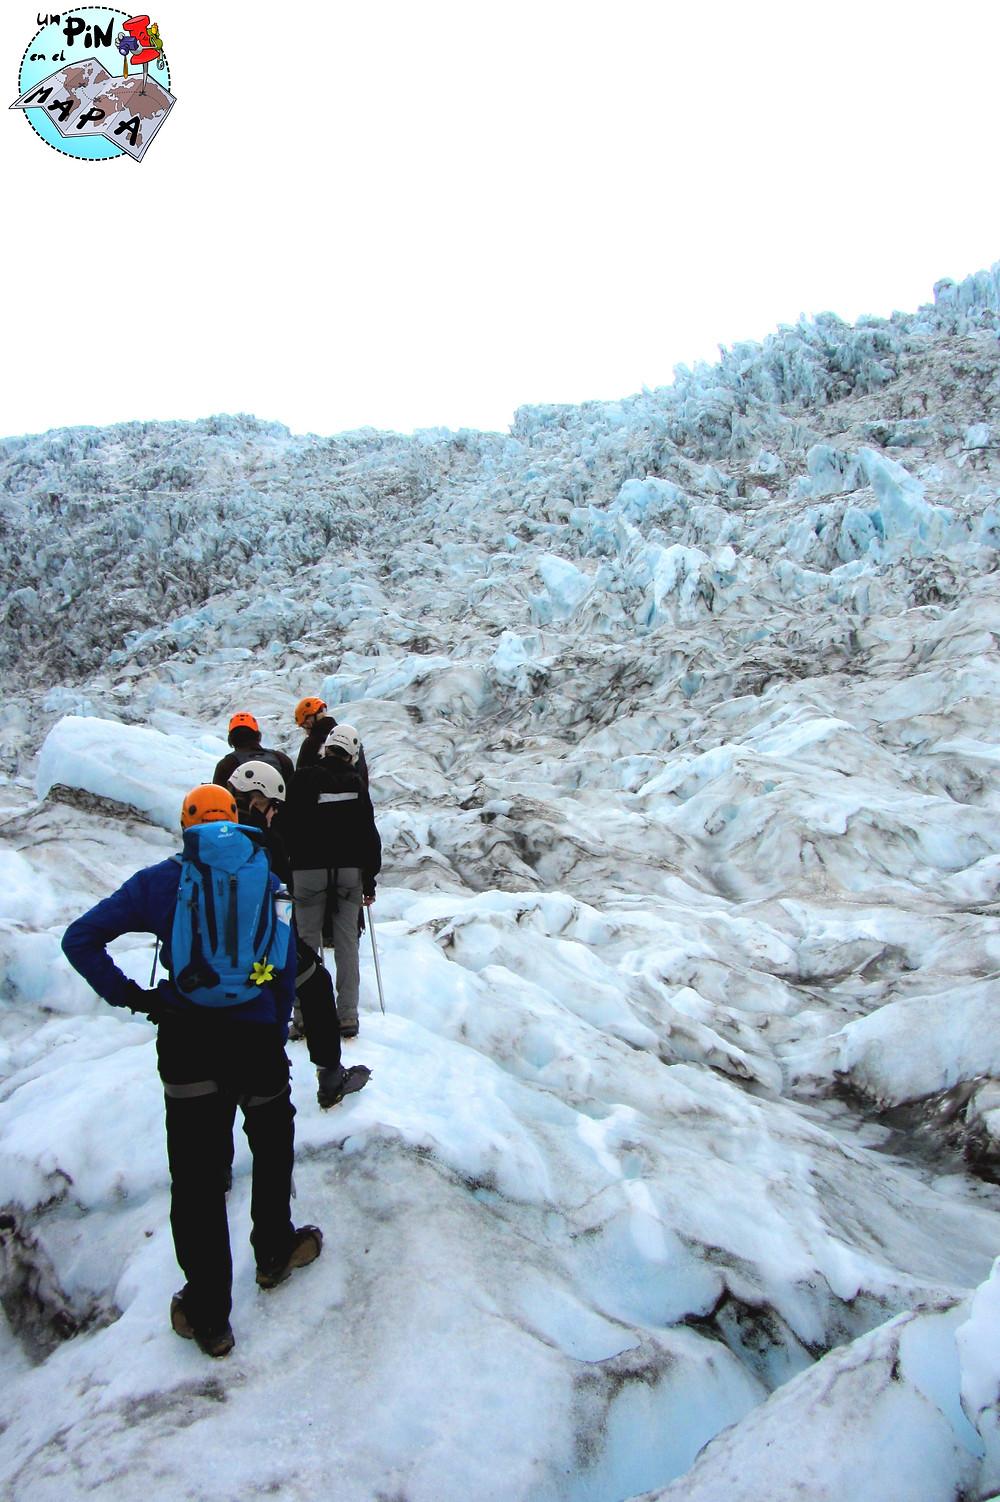 Glaciar Fjallsarlon, Islandia | Un Pin en el Mapa